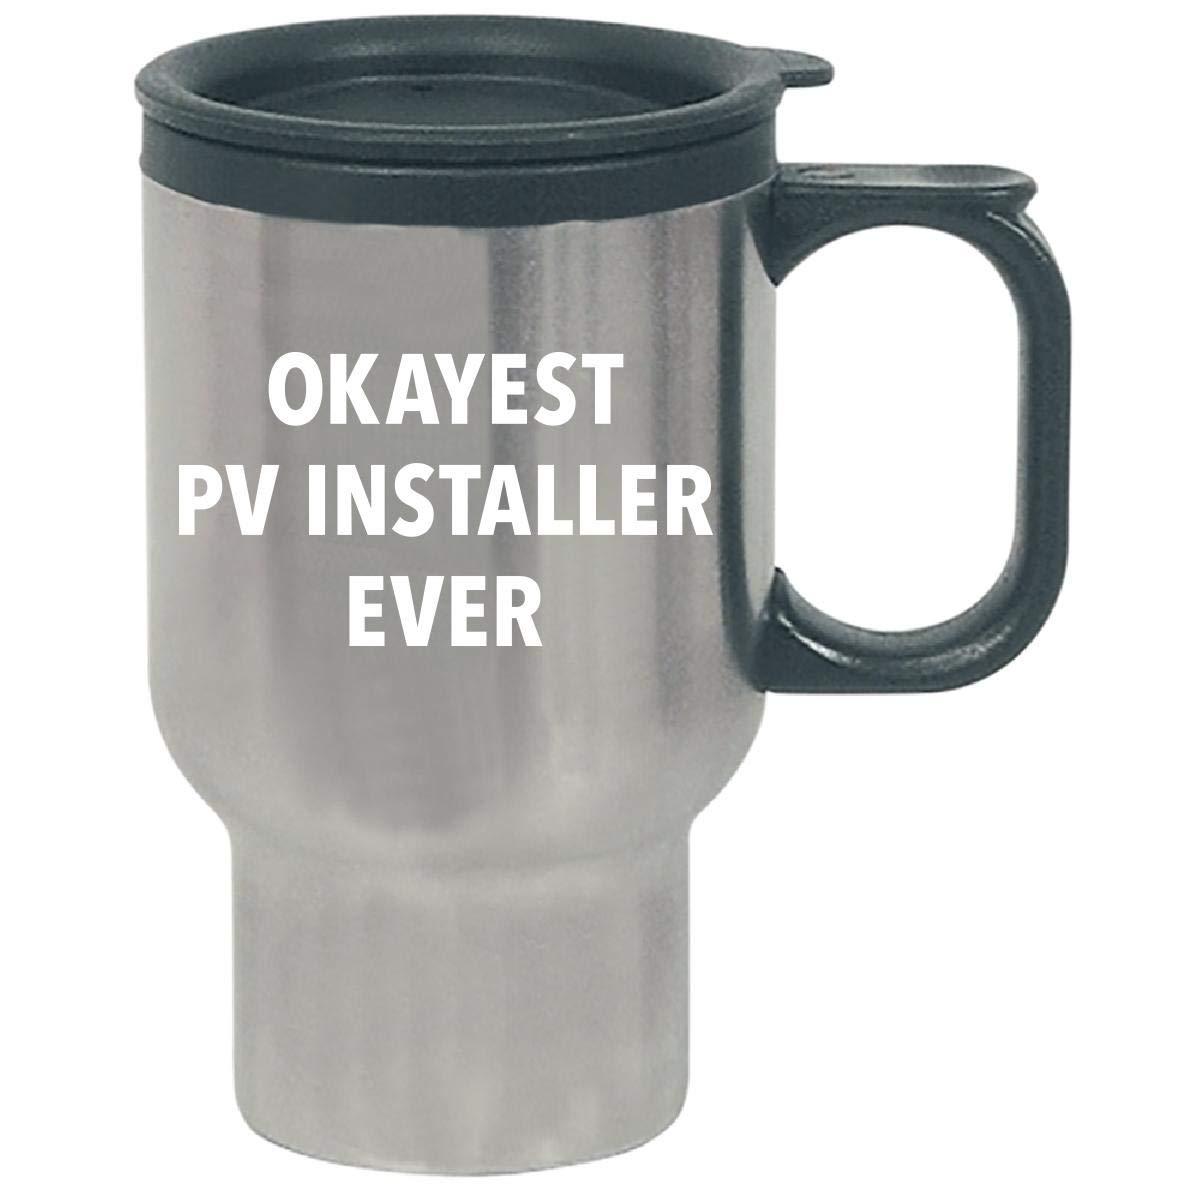 Okayest Pv Installer Ever Sarcastic Funny Saying Solar Gift - Travel Mug